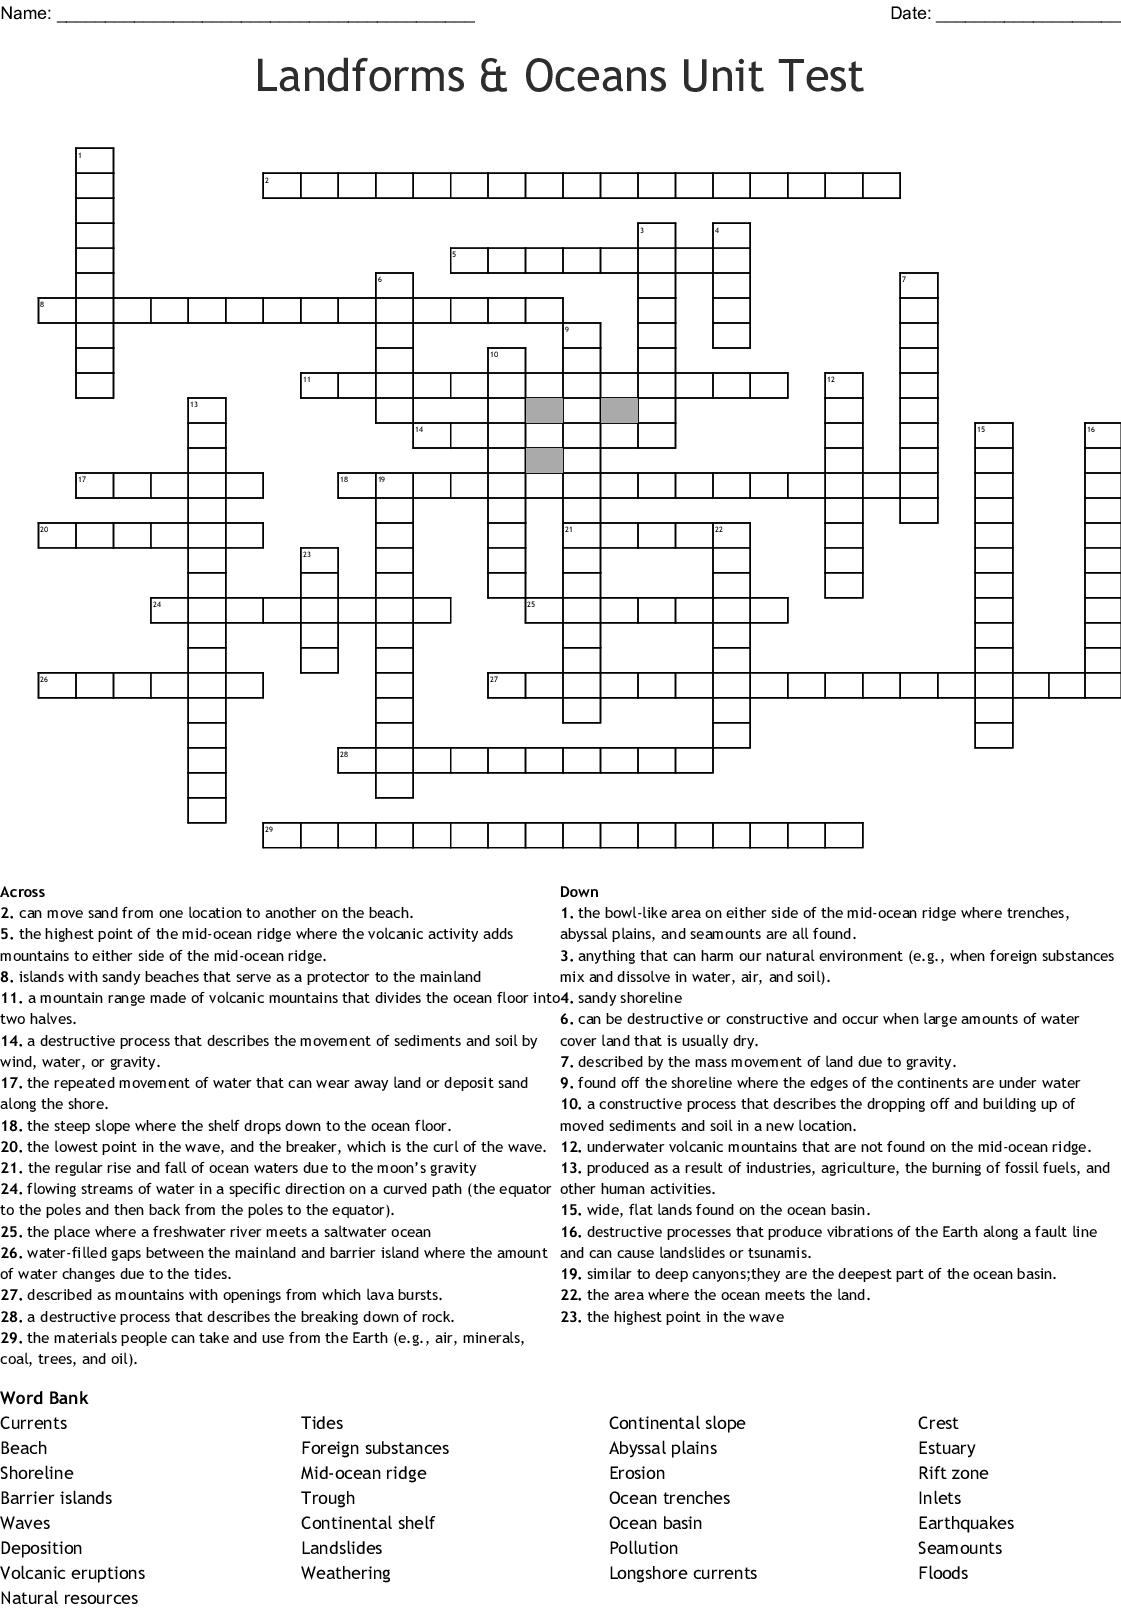 Landforms Amp Oceans Unit Test Crossword